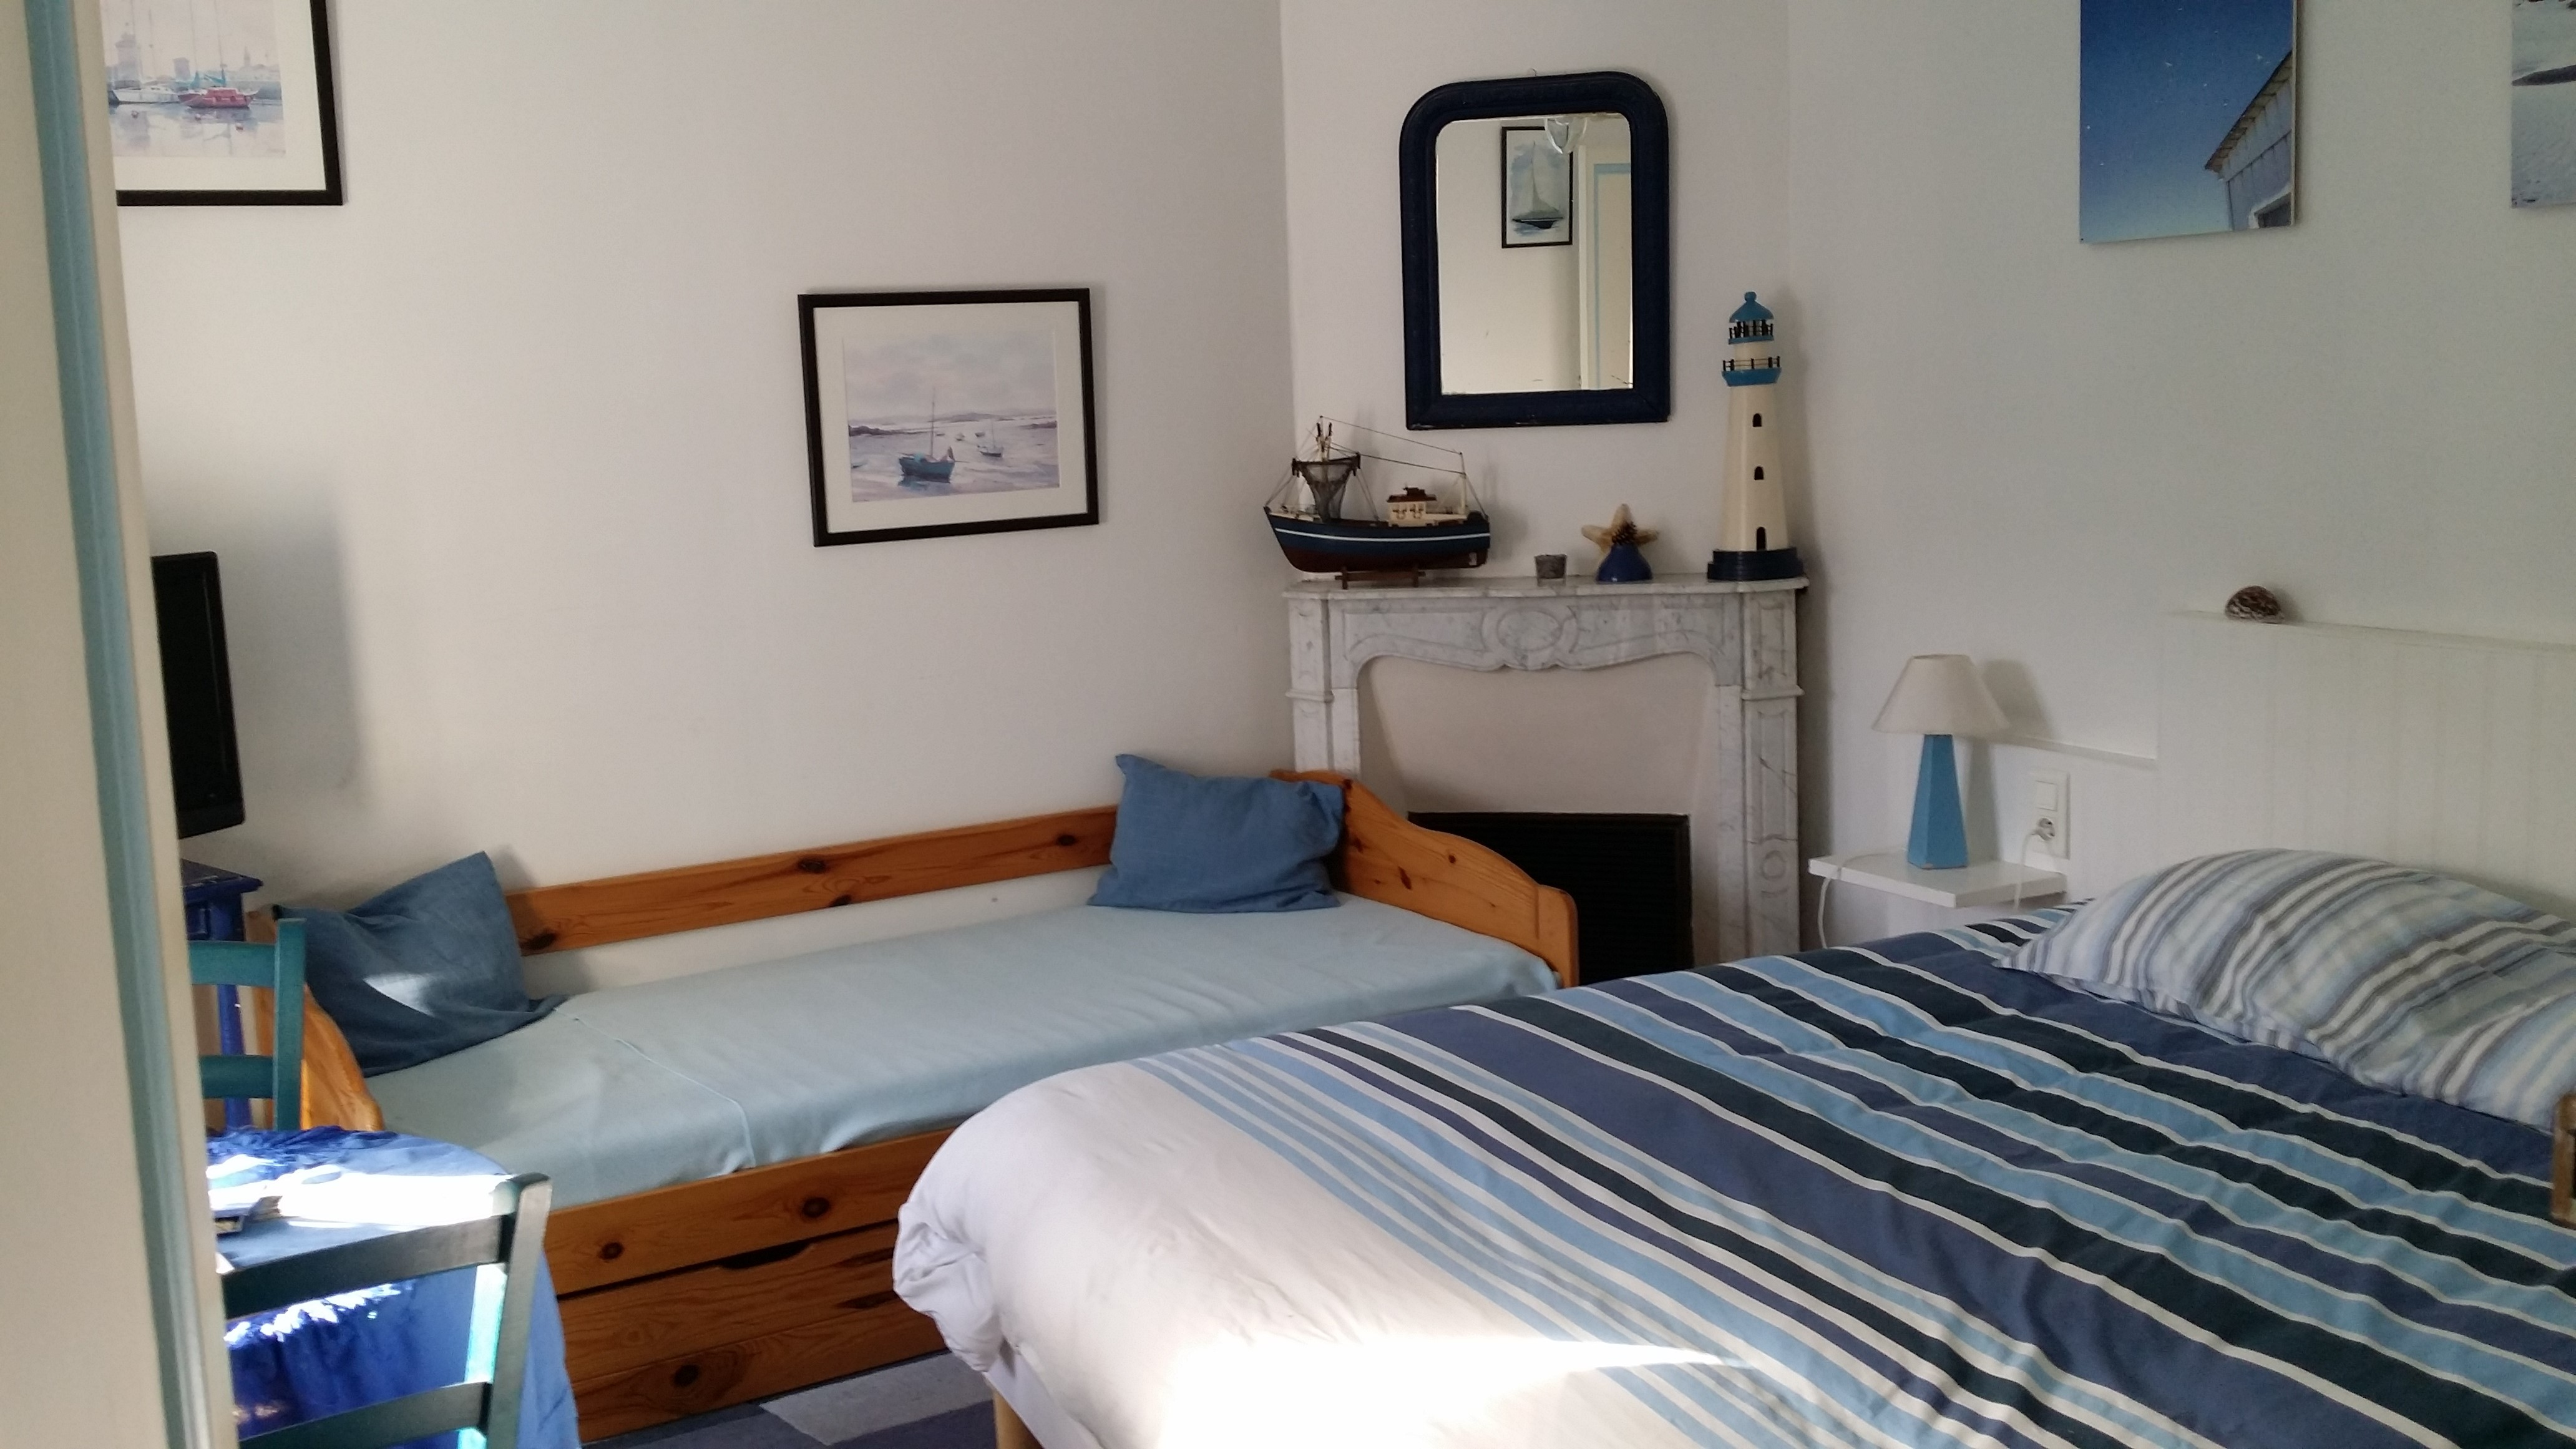 chambre marine g te et chambres d 39 h tes pornic. Black Bedroom Furniture Sets. Home Design Ideas